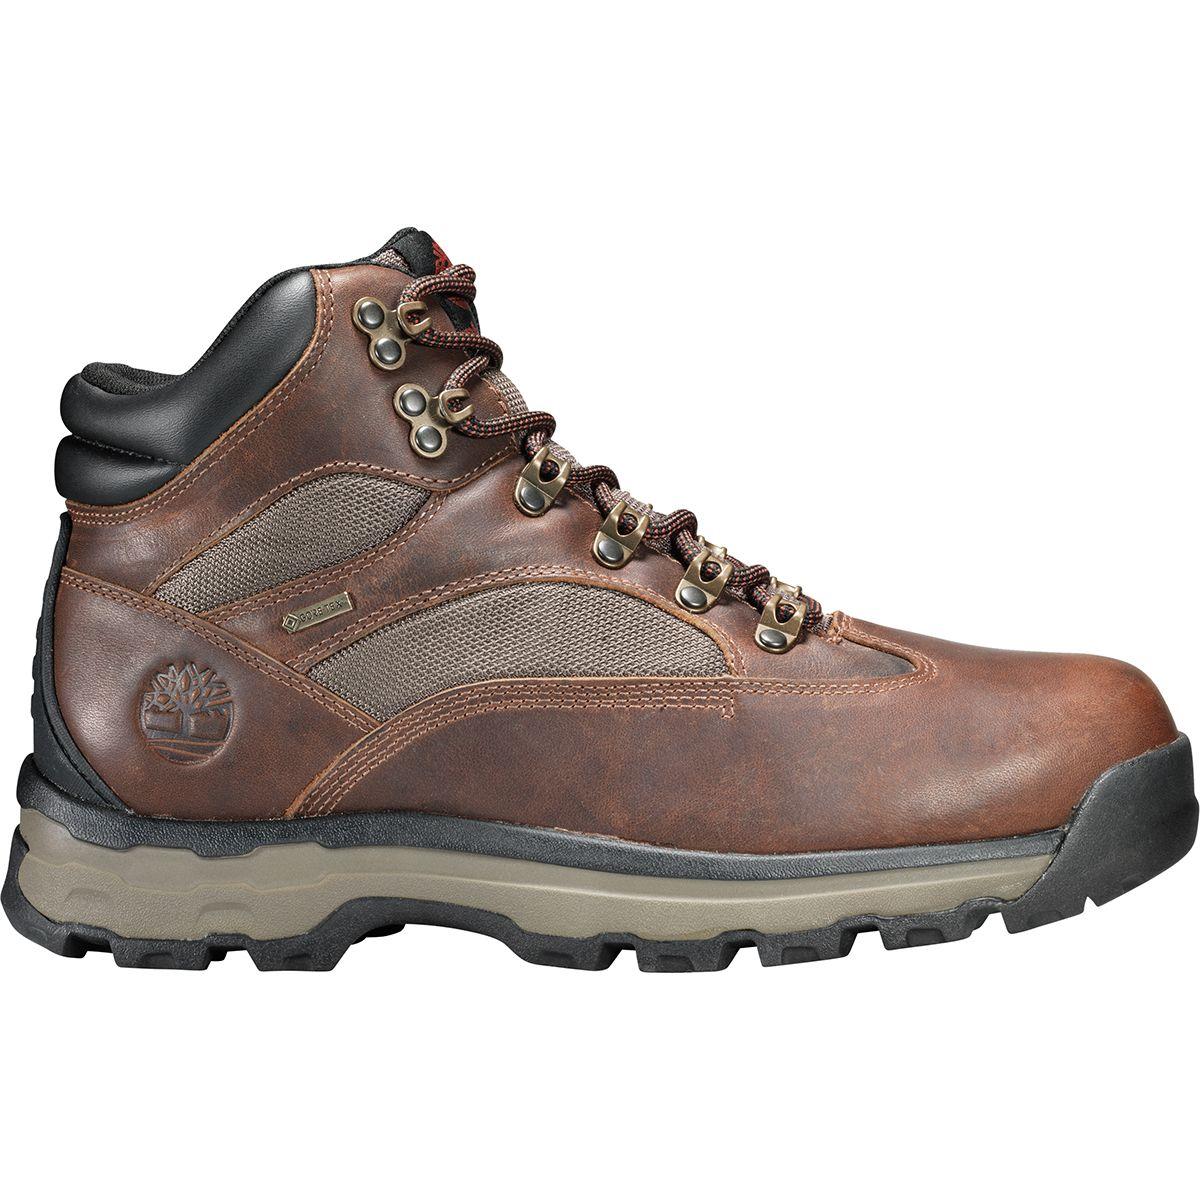 90266fb8b2b Timberland Chocorua Trail 2 Mid GTX Boot Mens Medium Brown Full Grain 80